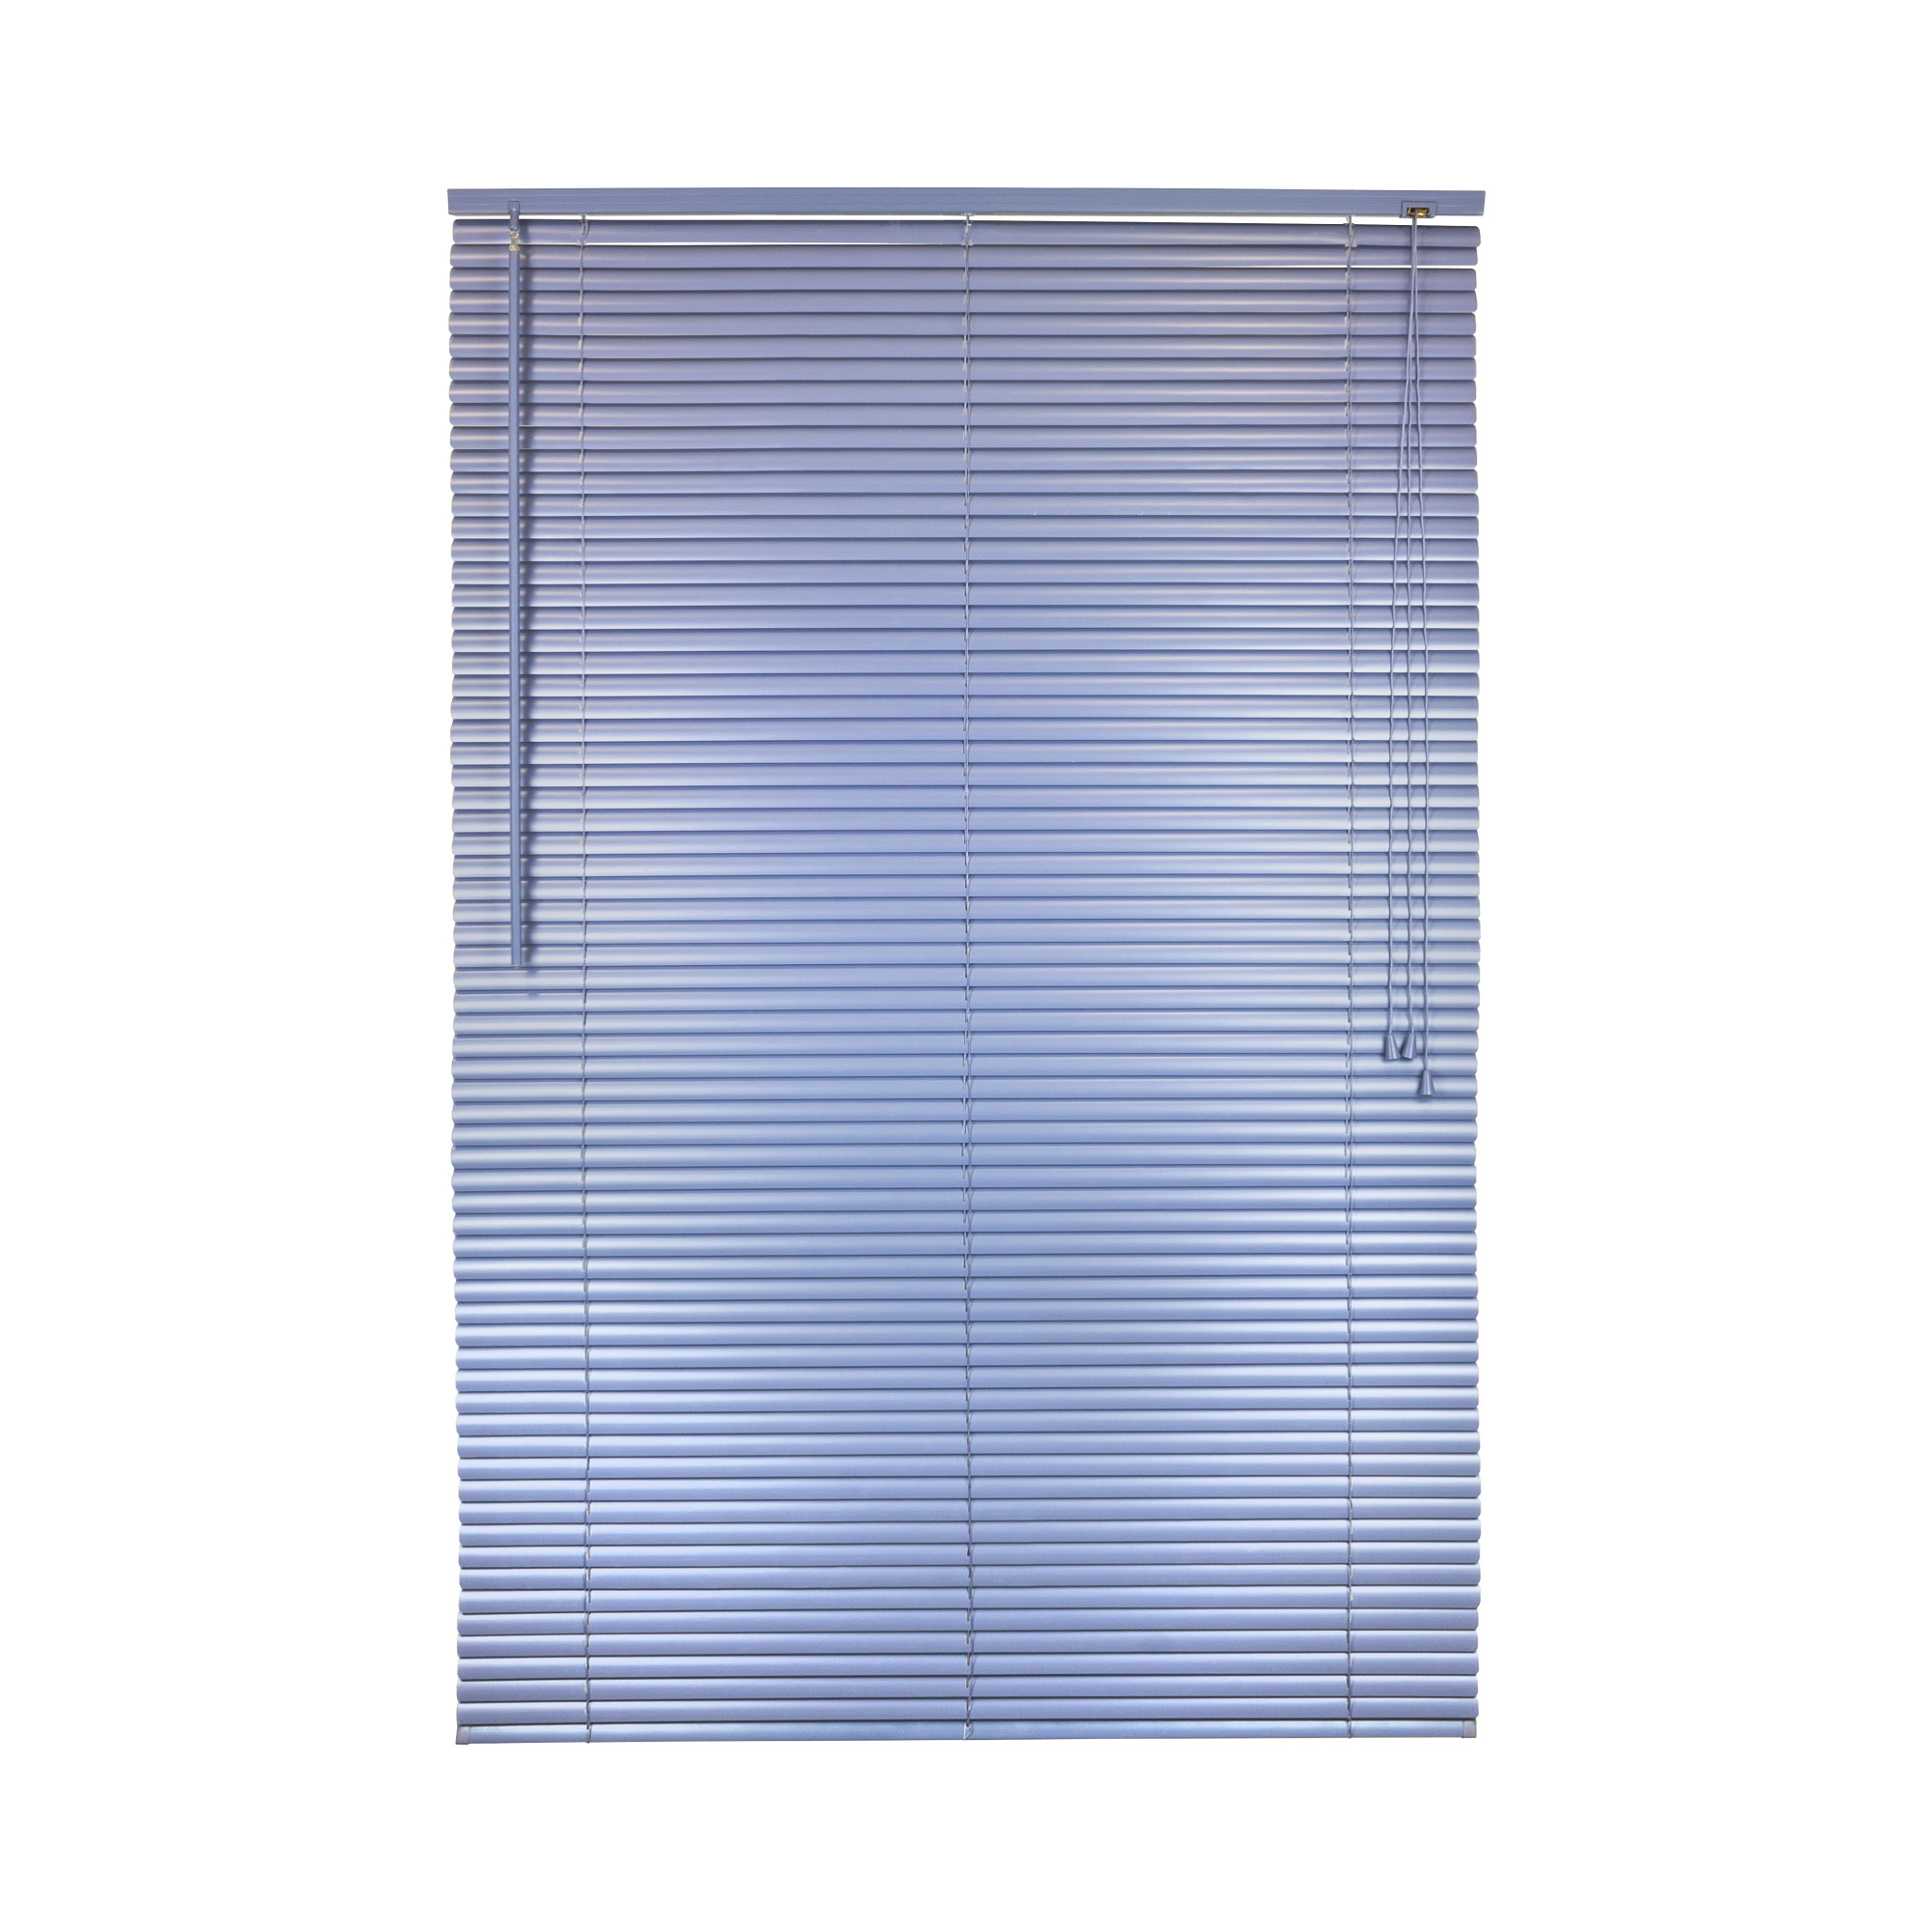 Persiana Horizontal PVC 100x150 cm Azul - Liyang